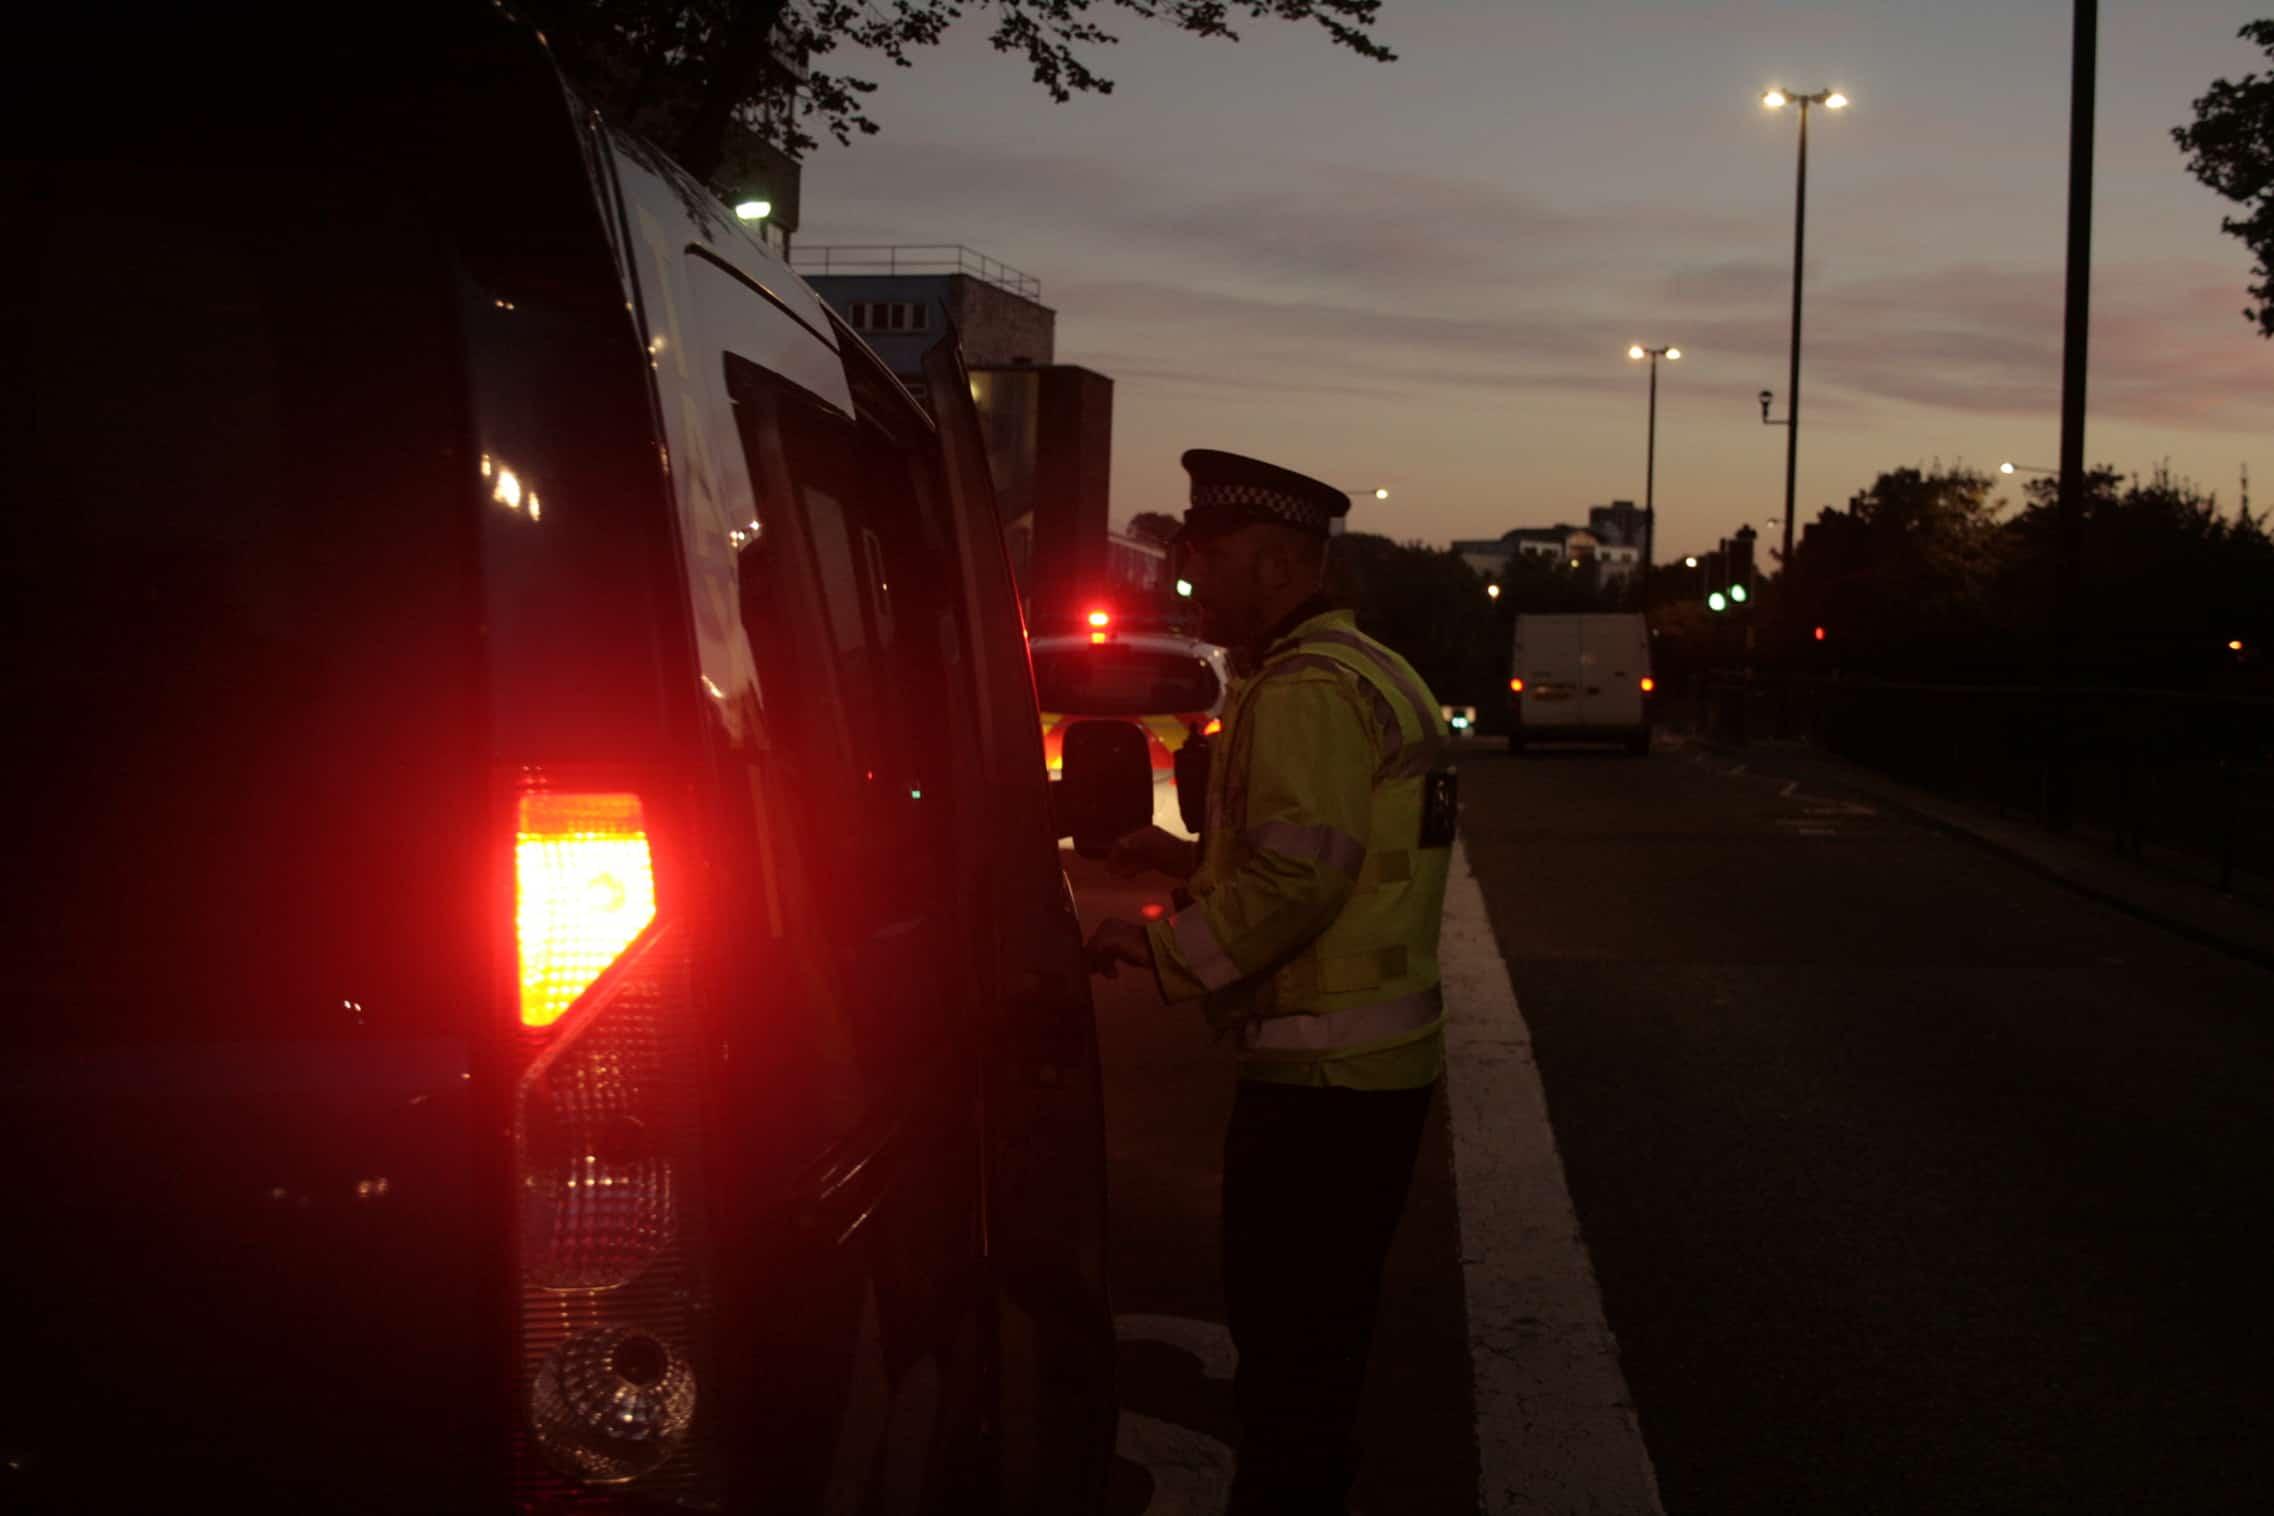 PC Patrick Quinton on patrol in Bristol cicty centre